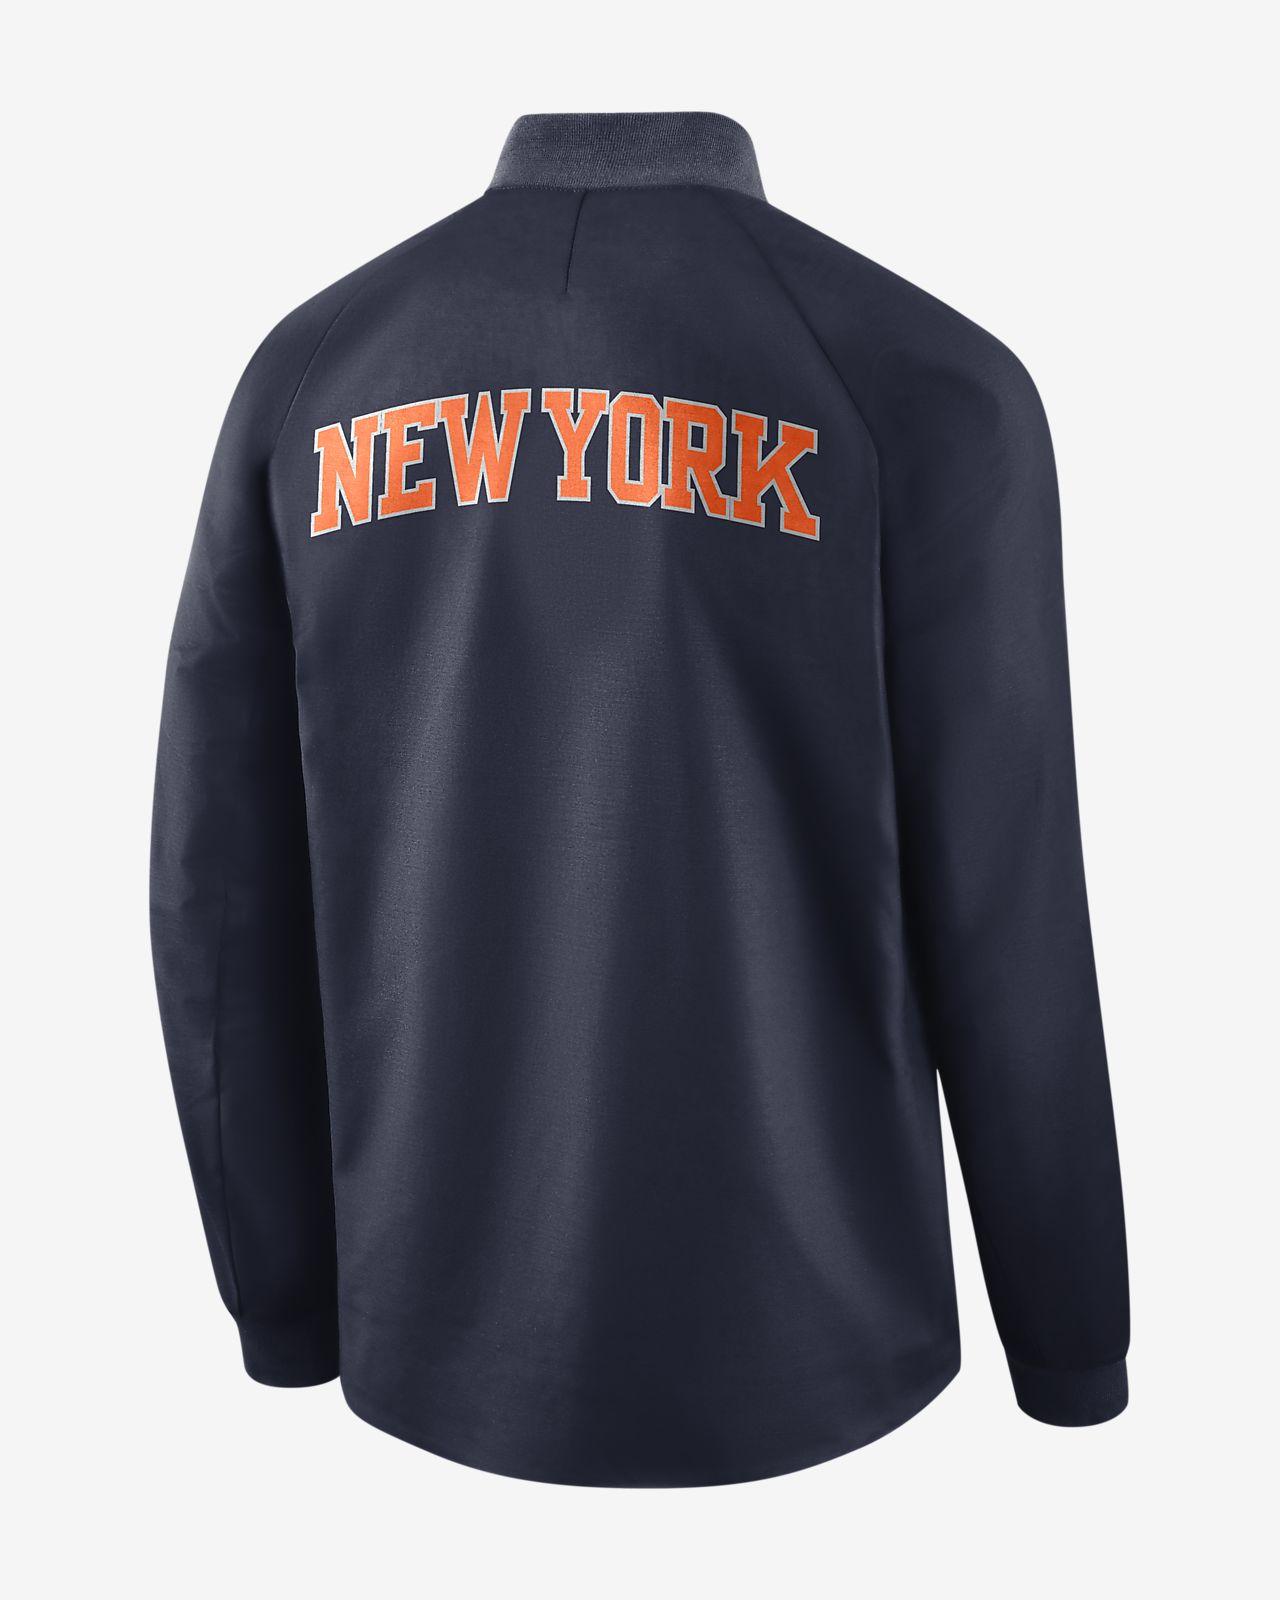 ... New York Knicks City Edition Nike Modern Men's NBA Varsity Jacket